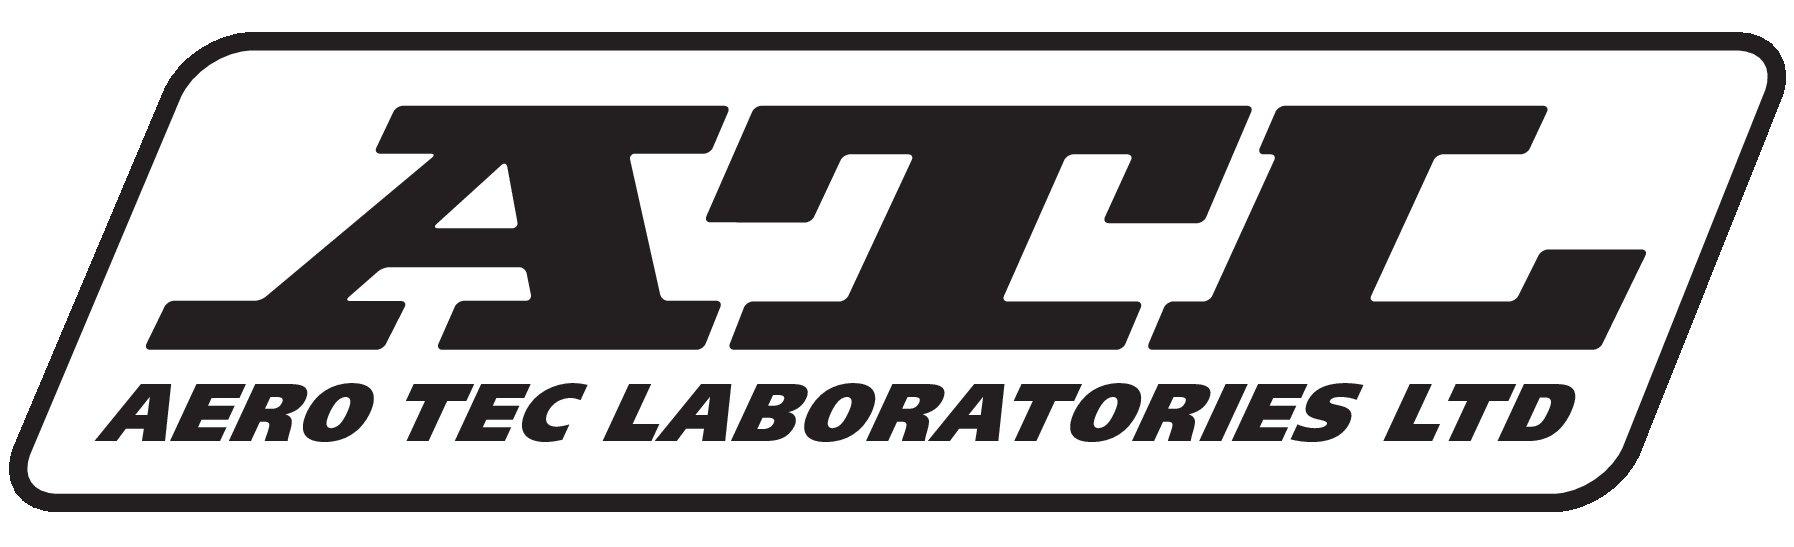 Aero Tec Laboratories Ltd